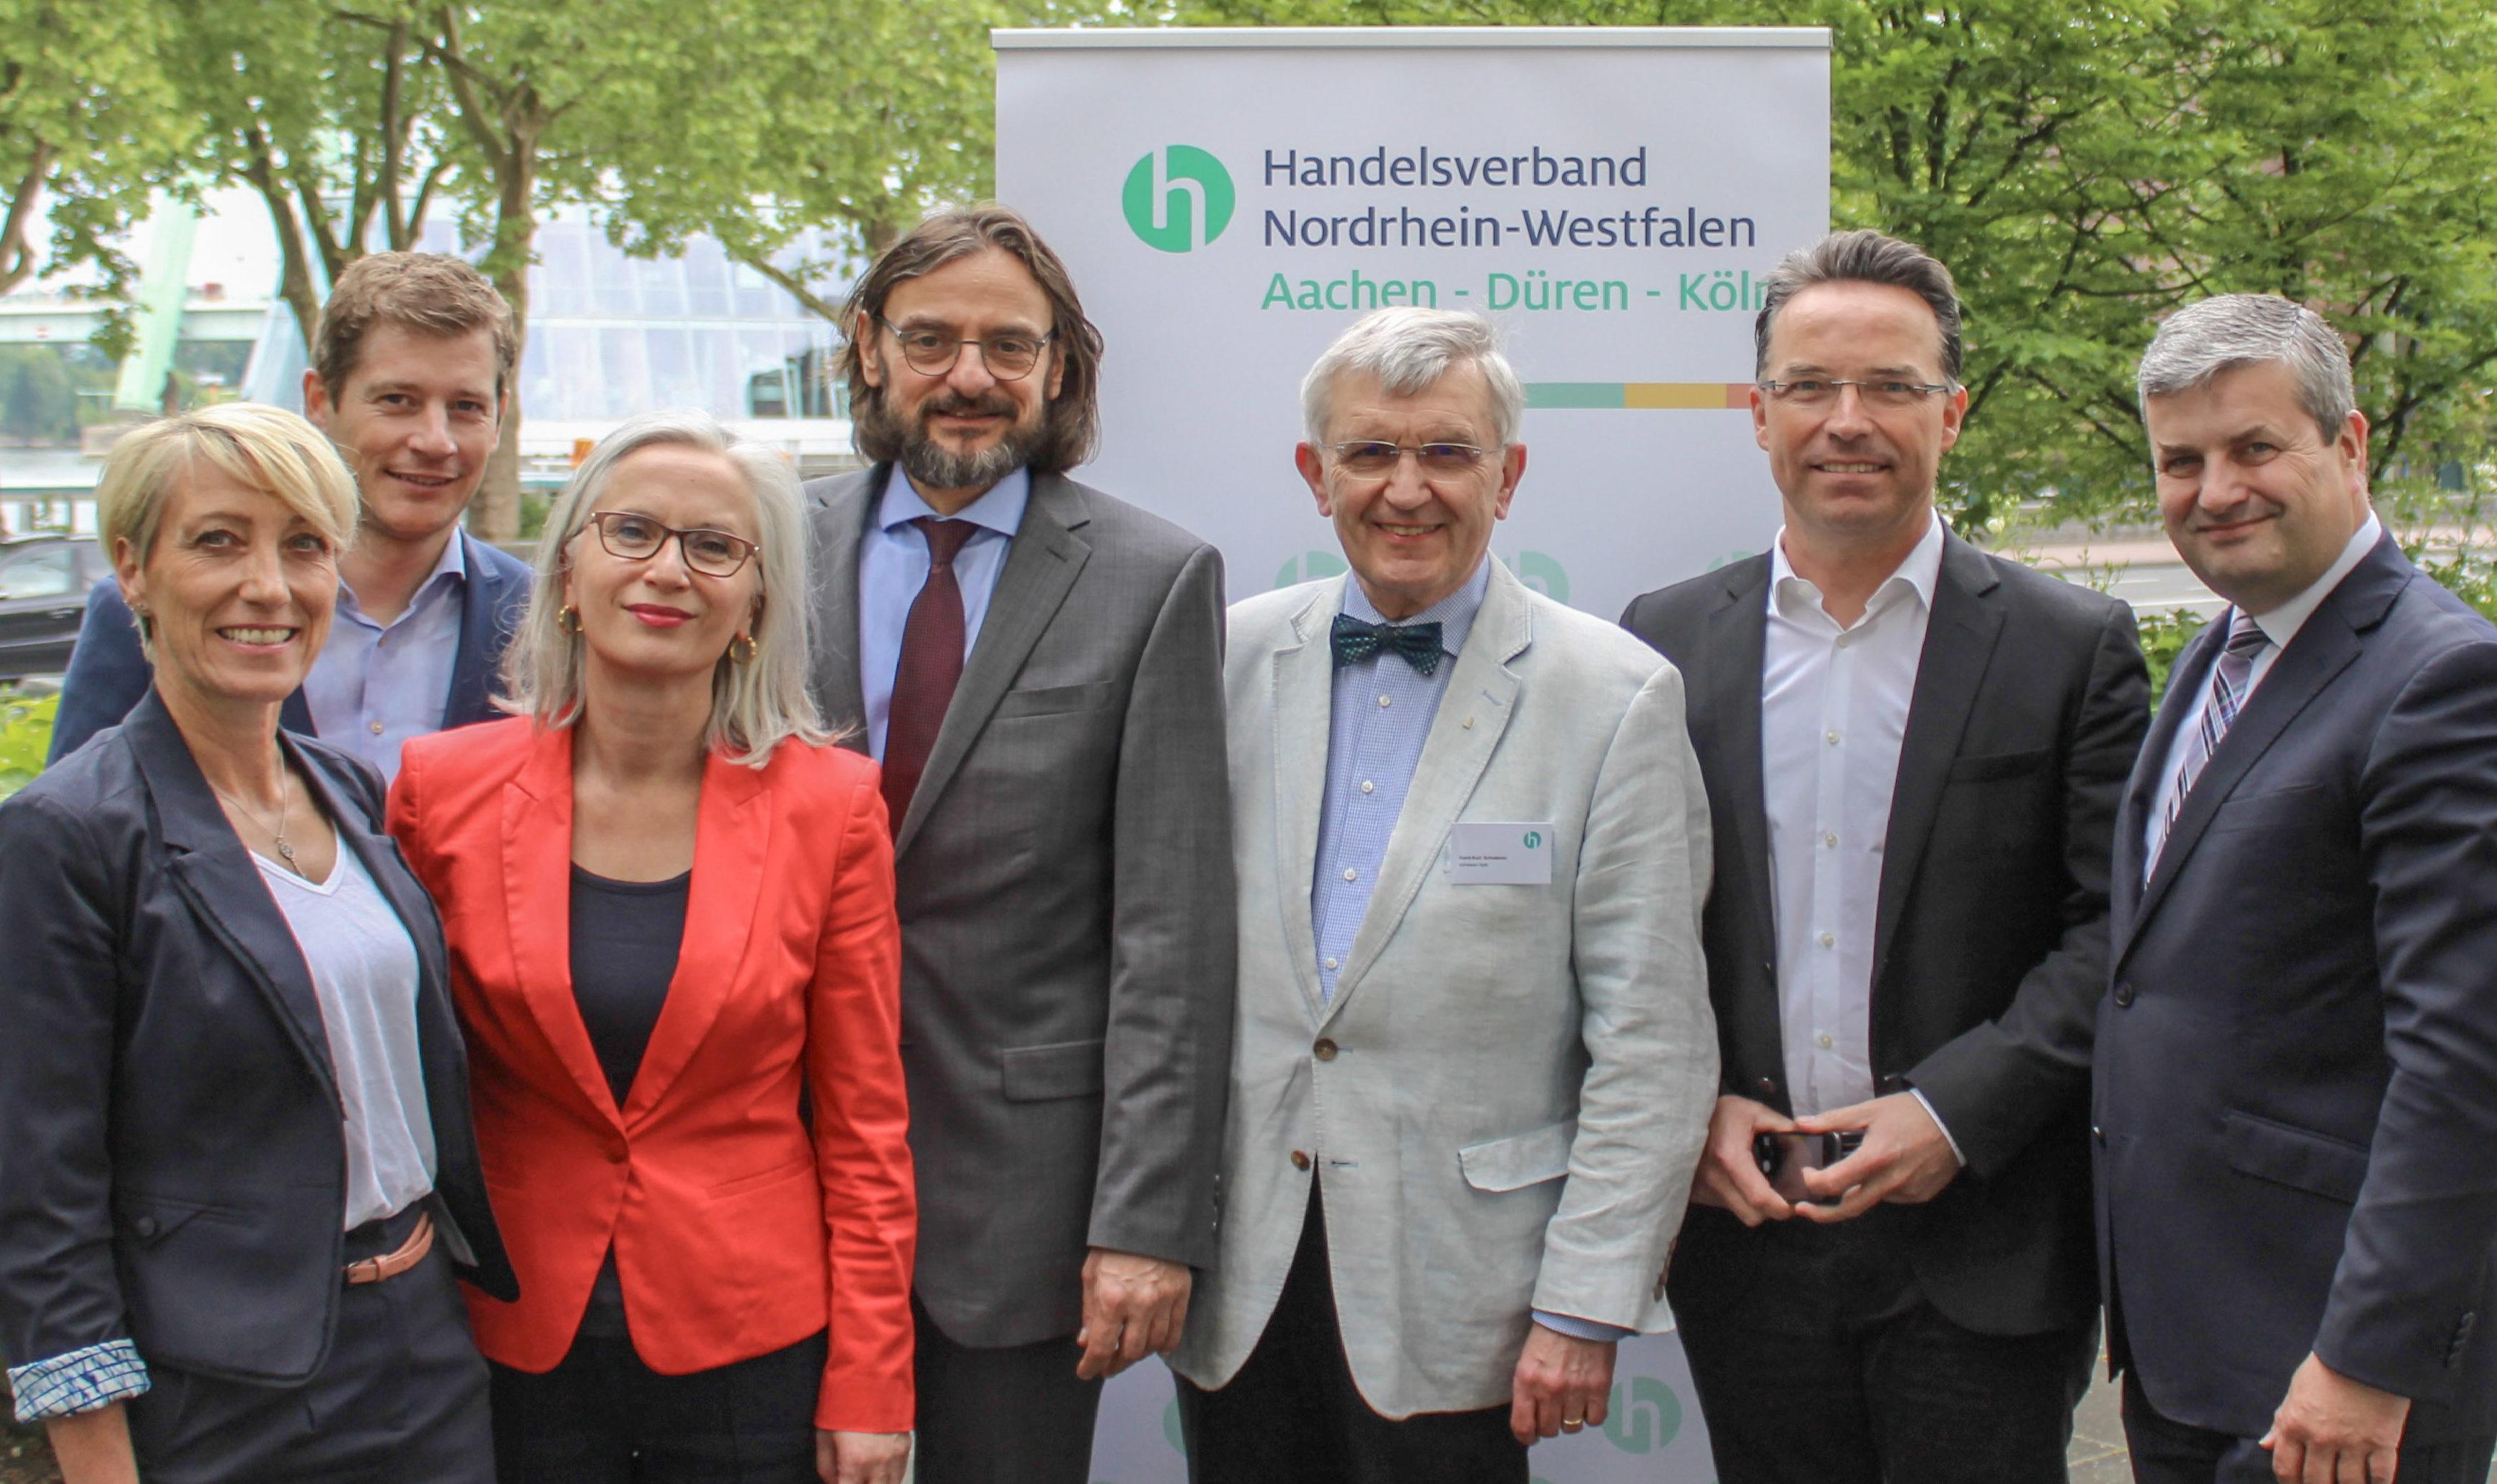 Vorstand des HV NRW Aachen Düren Köln e.V.